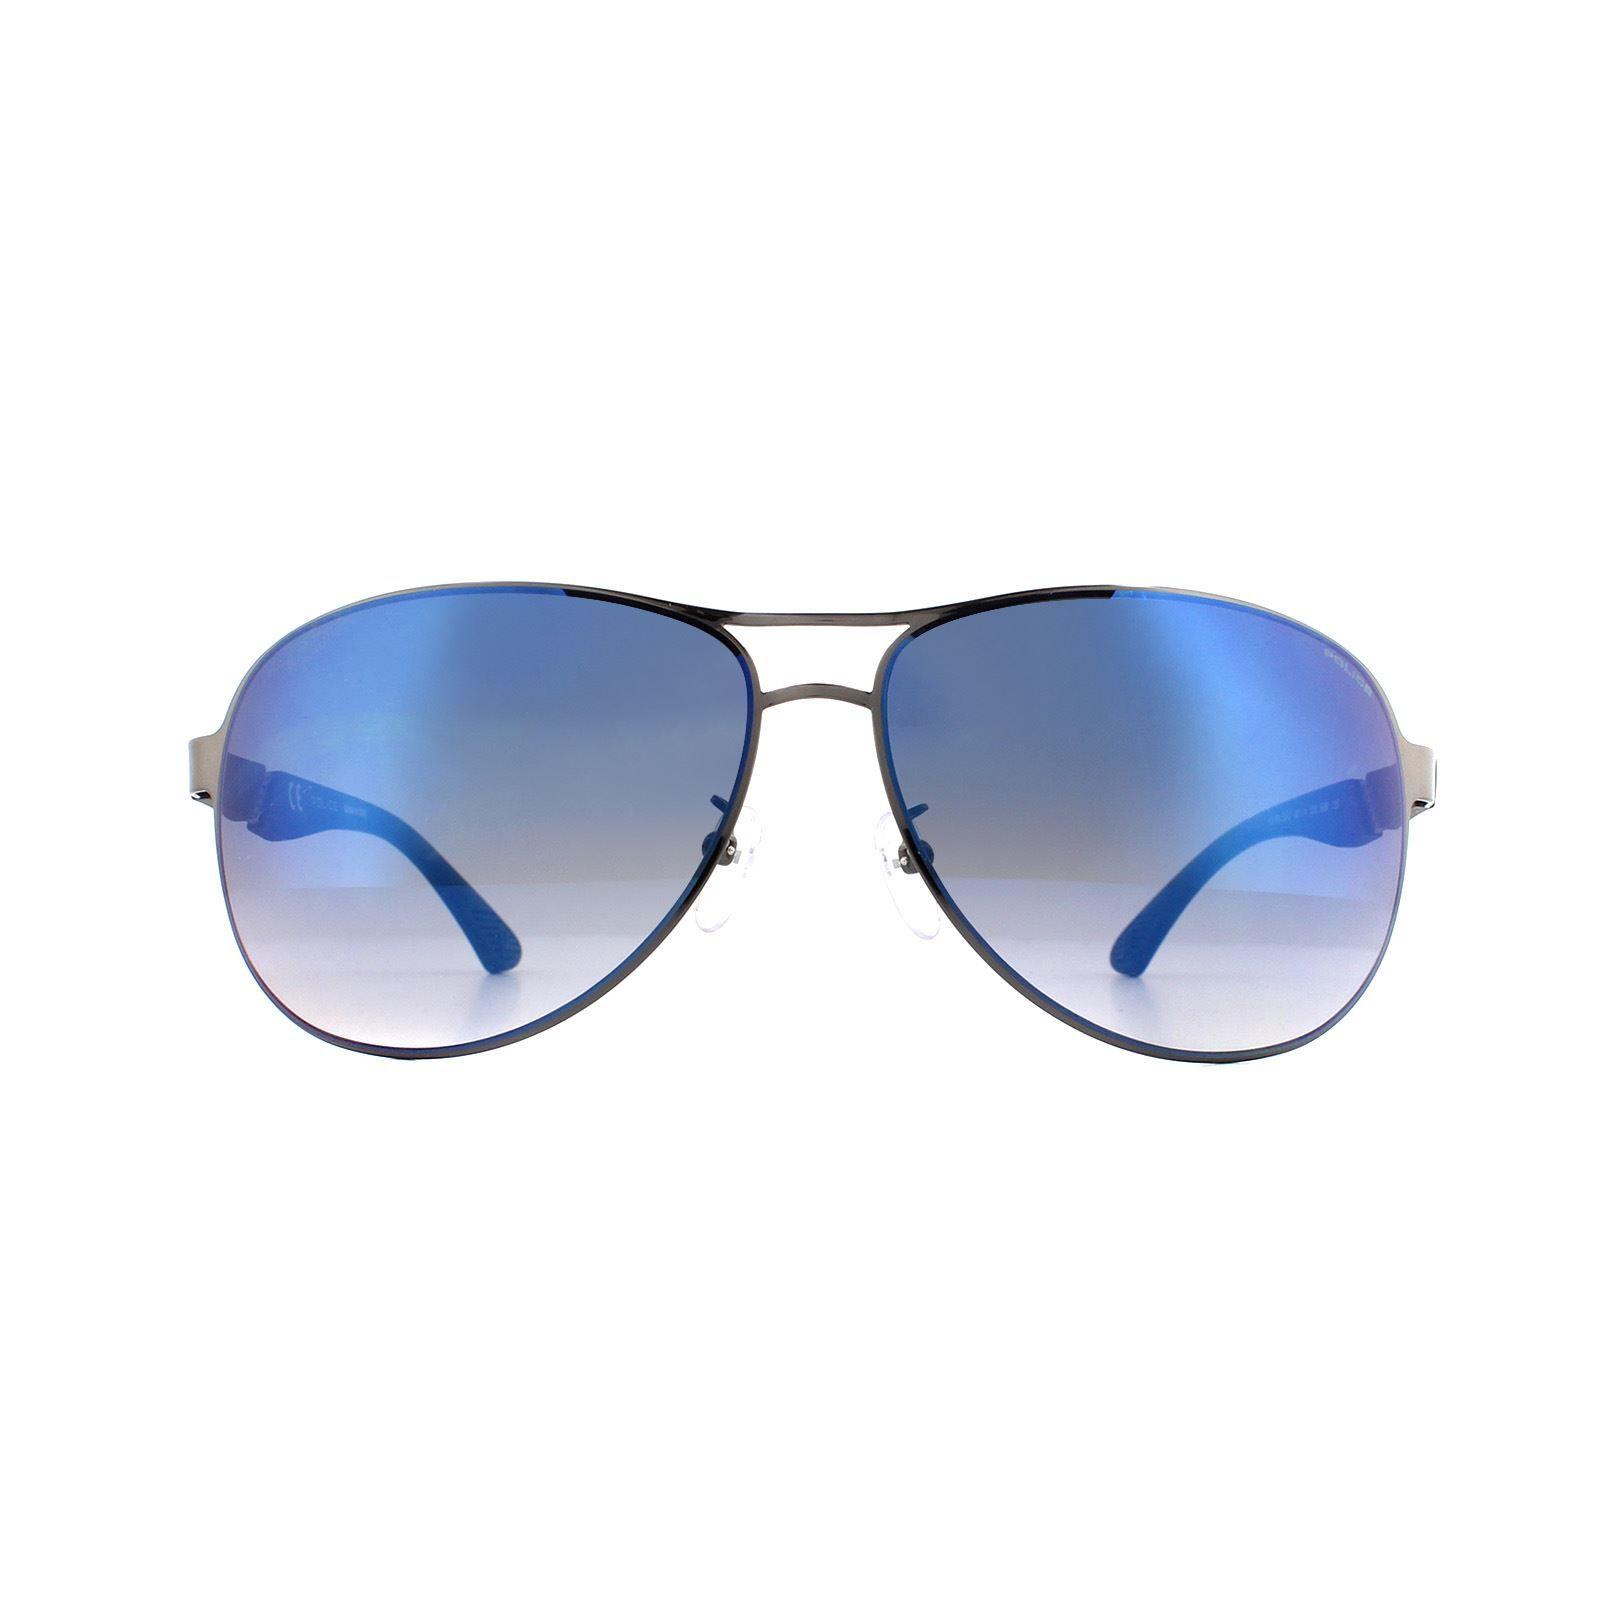 Police Sunglasses SPL534G 568B Shiny Ruthenium Blue Gradient